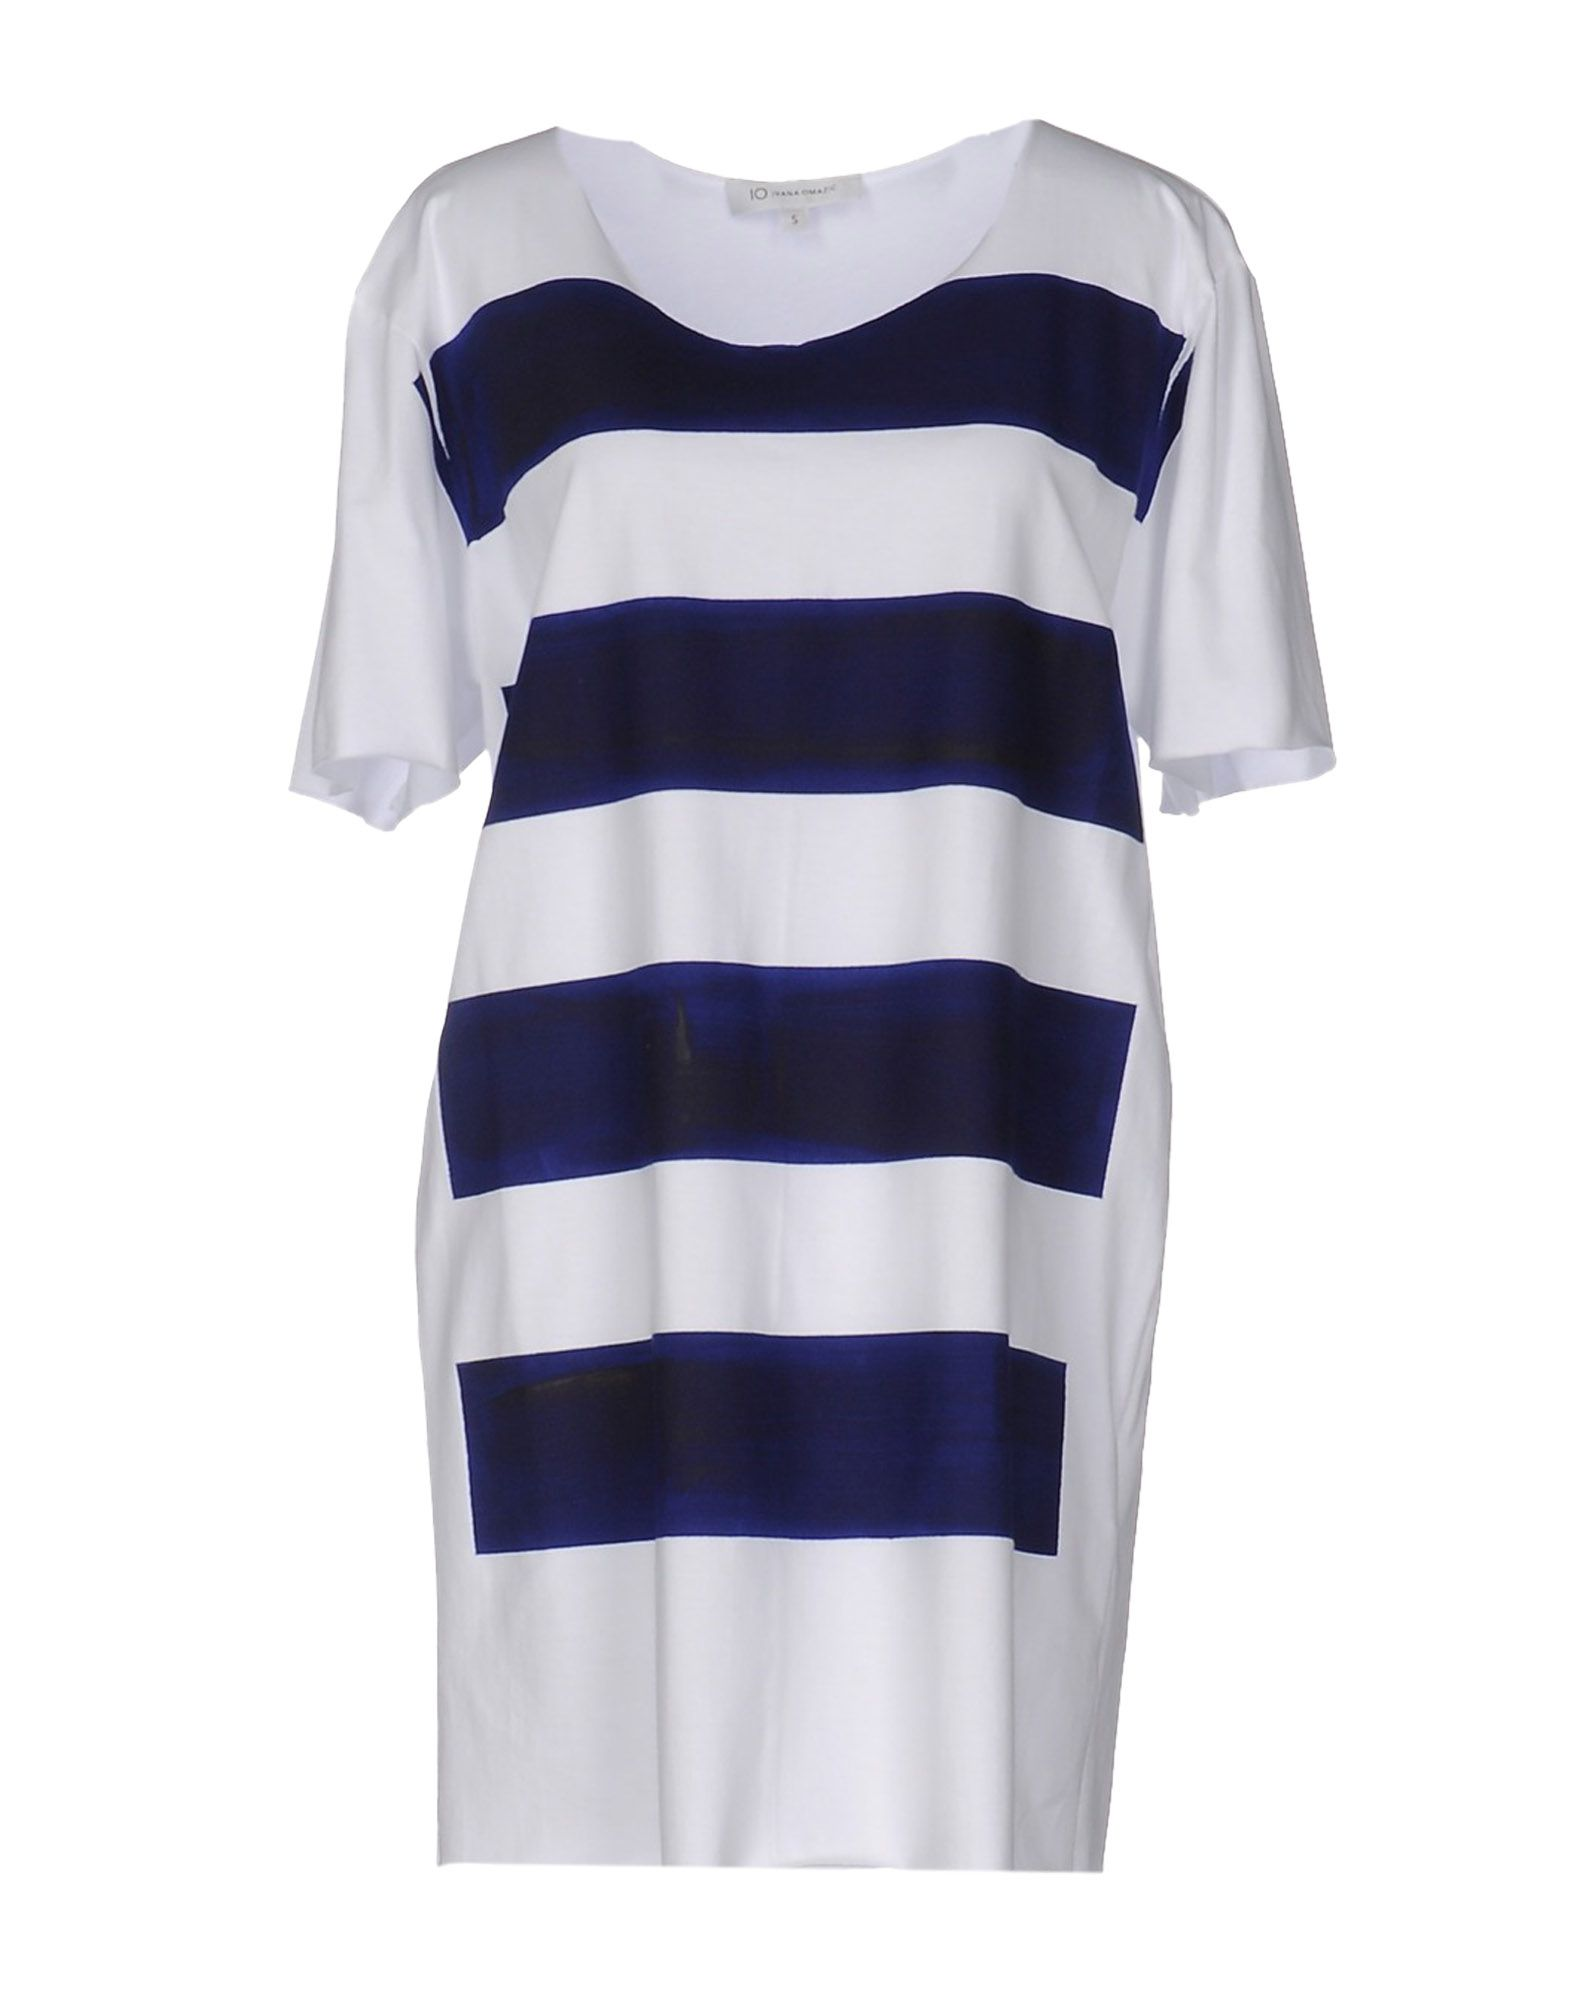 IO IVANA OMAZIC Short Dresses in White